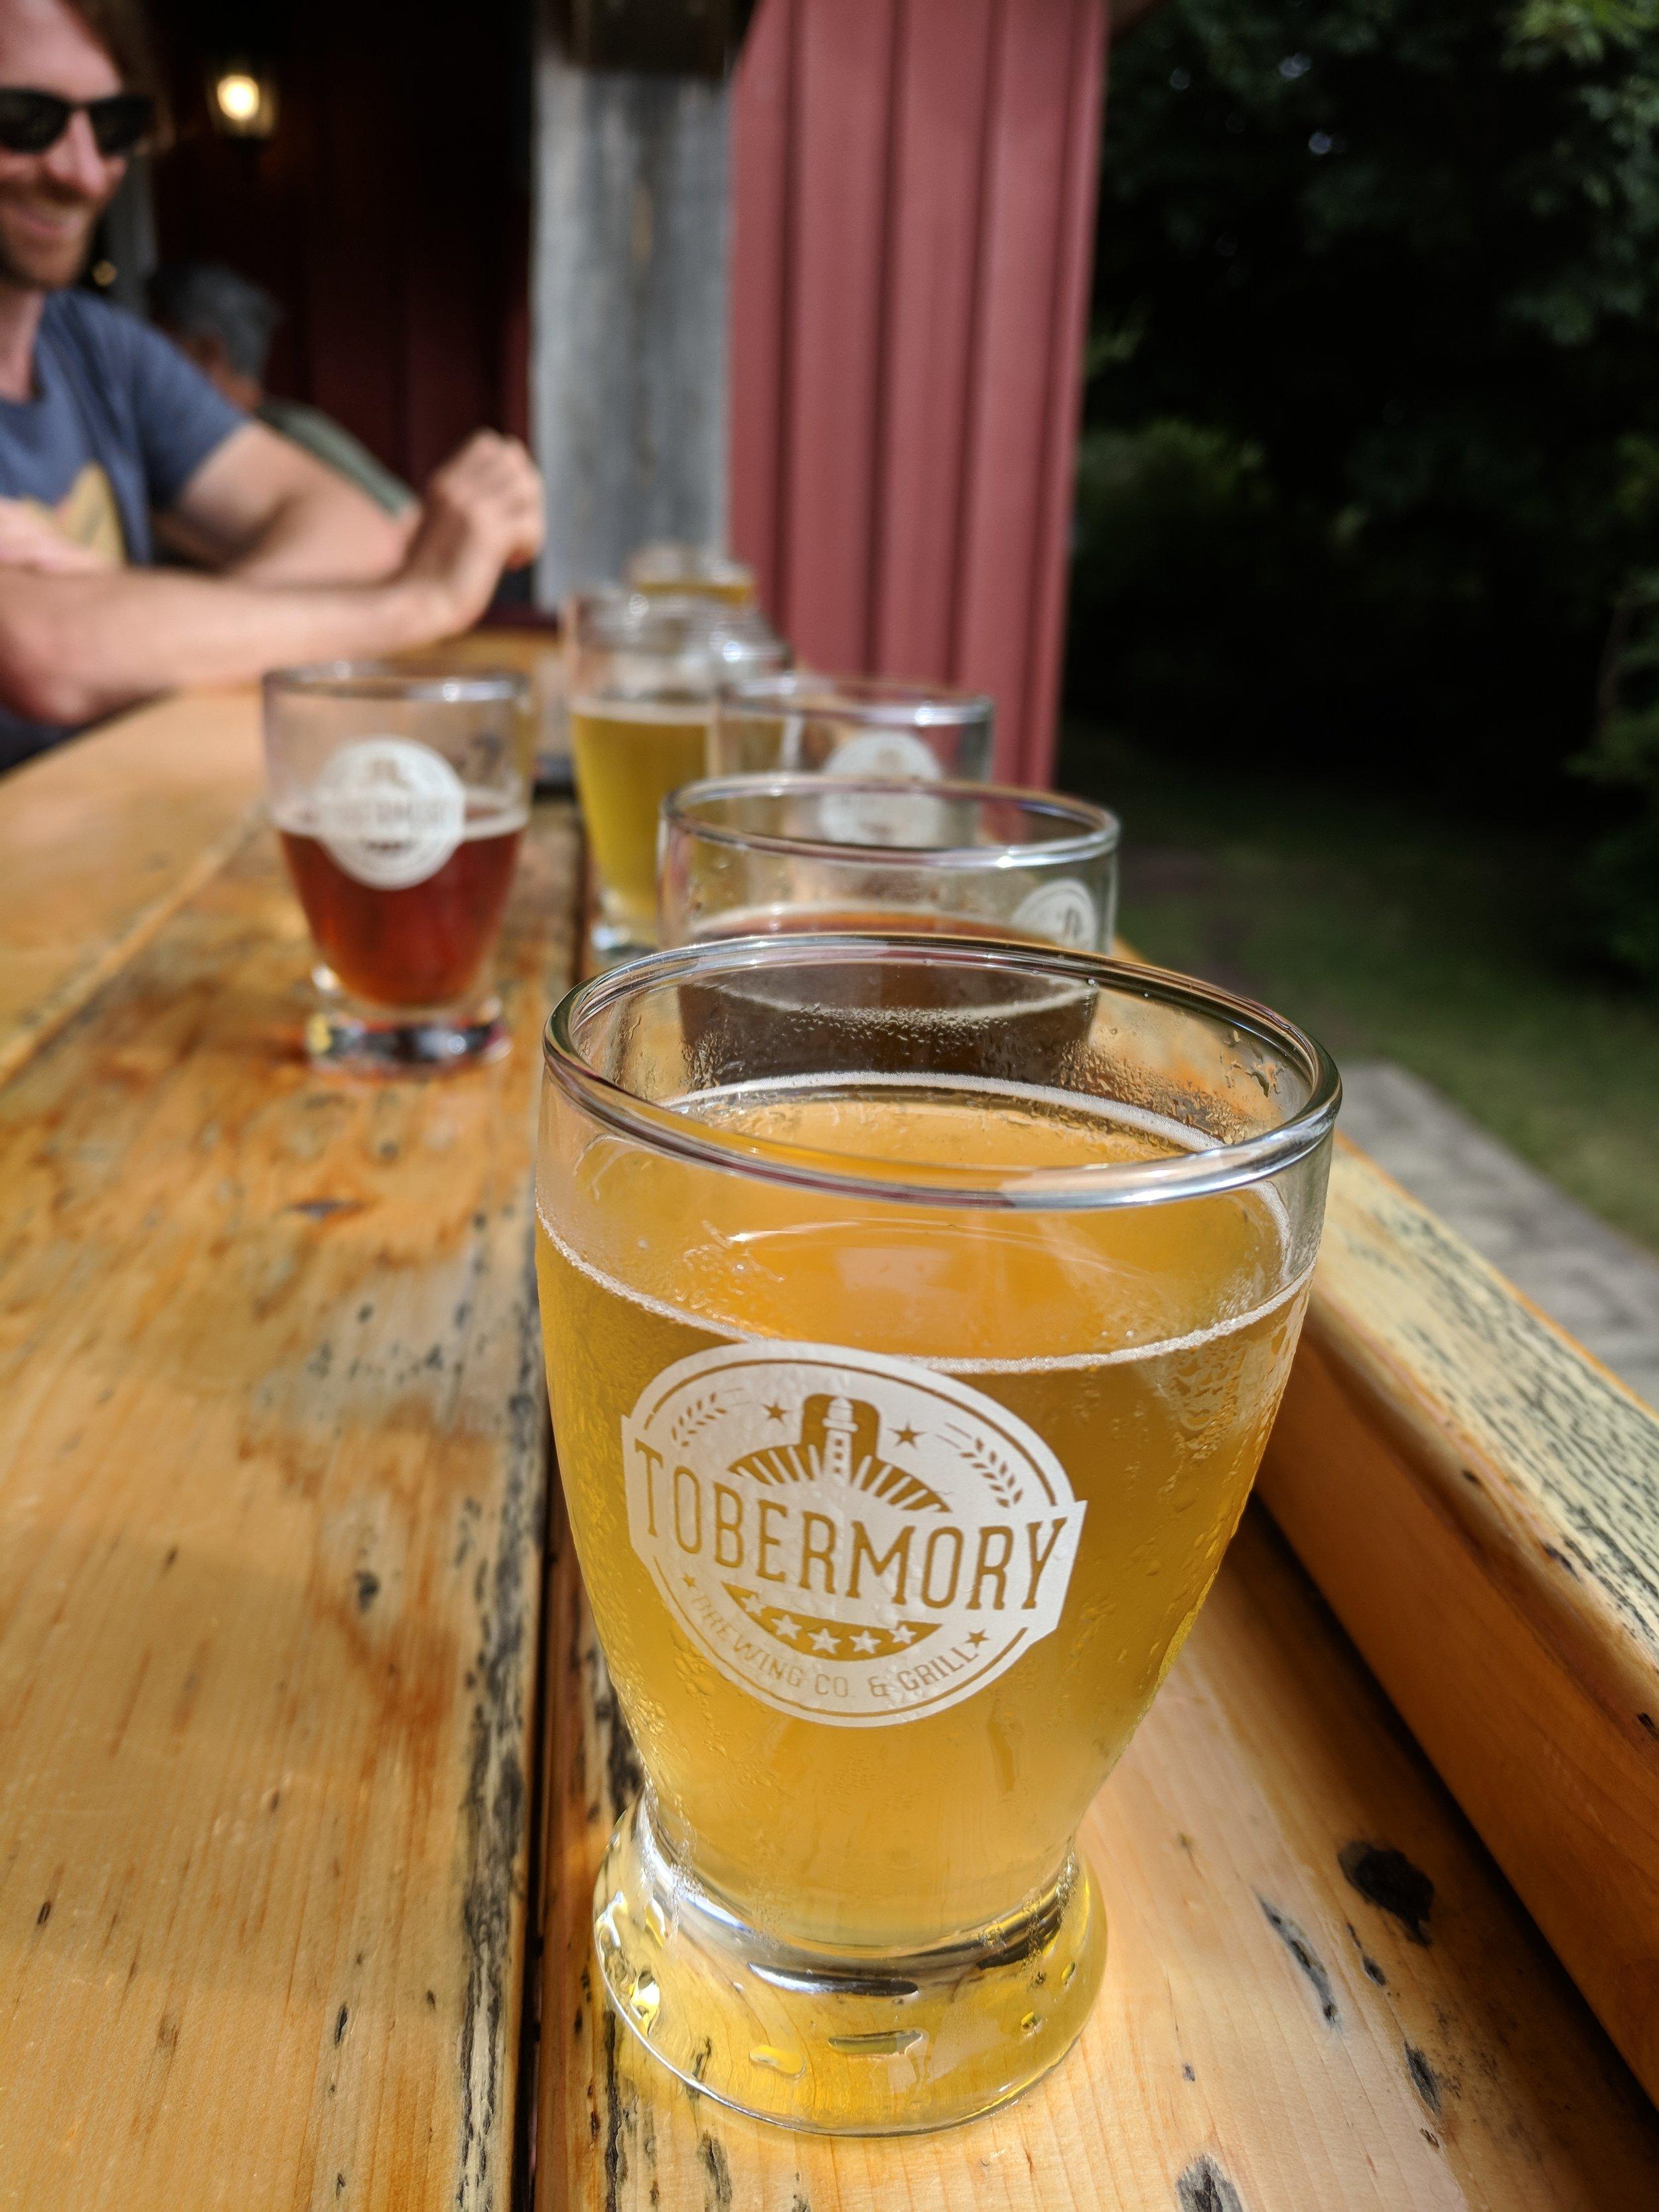 Tobermory Brewing